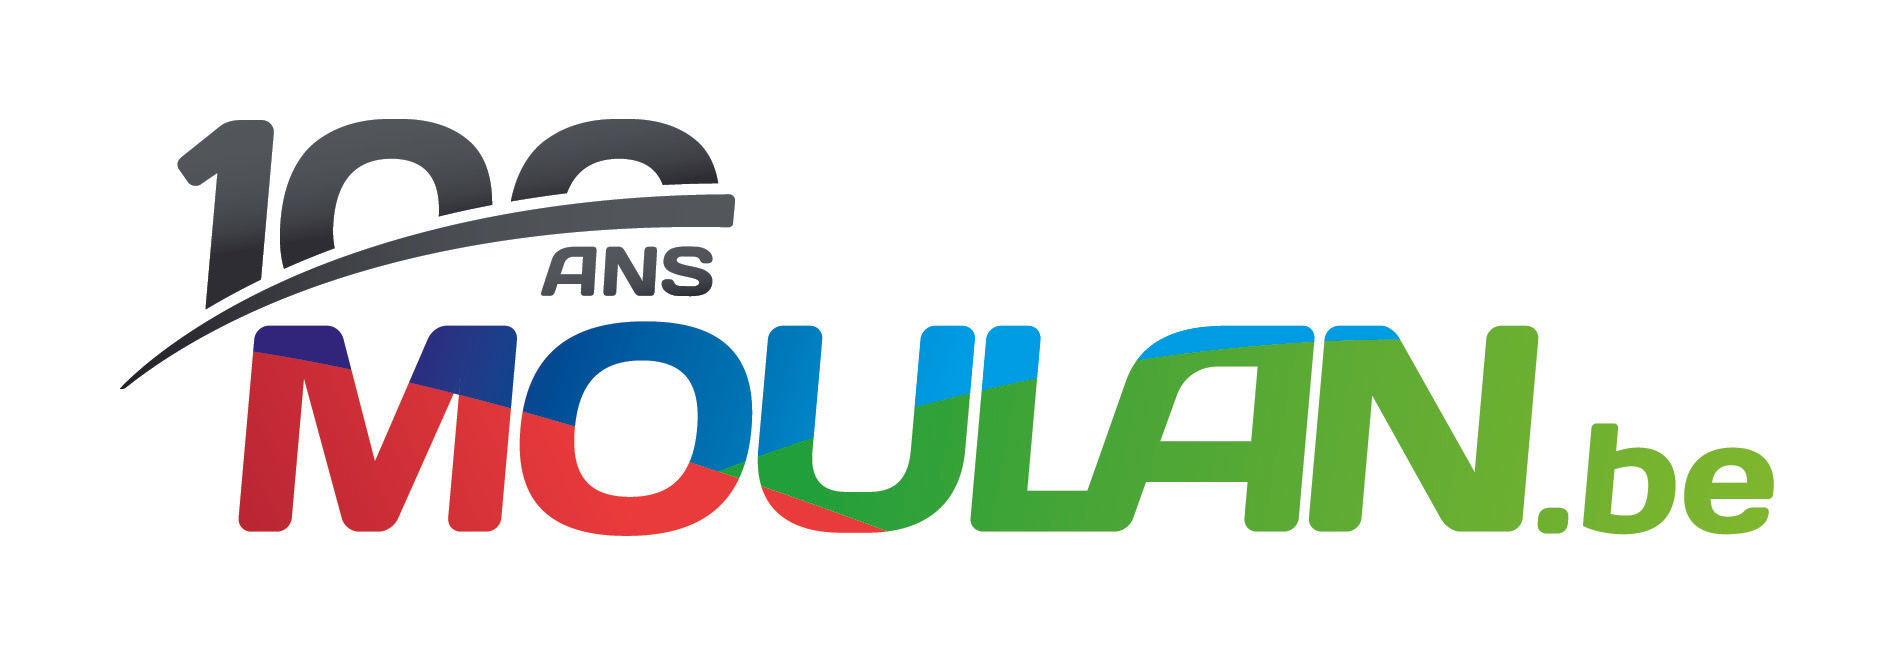 Logo 100 ans HD.jpg